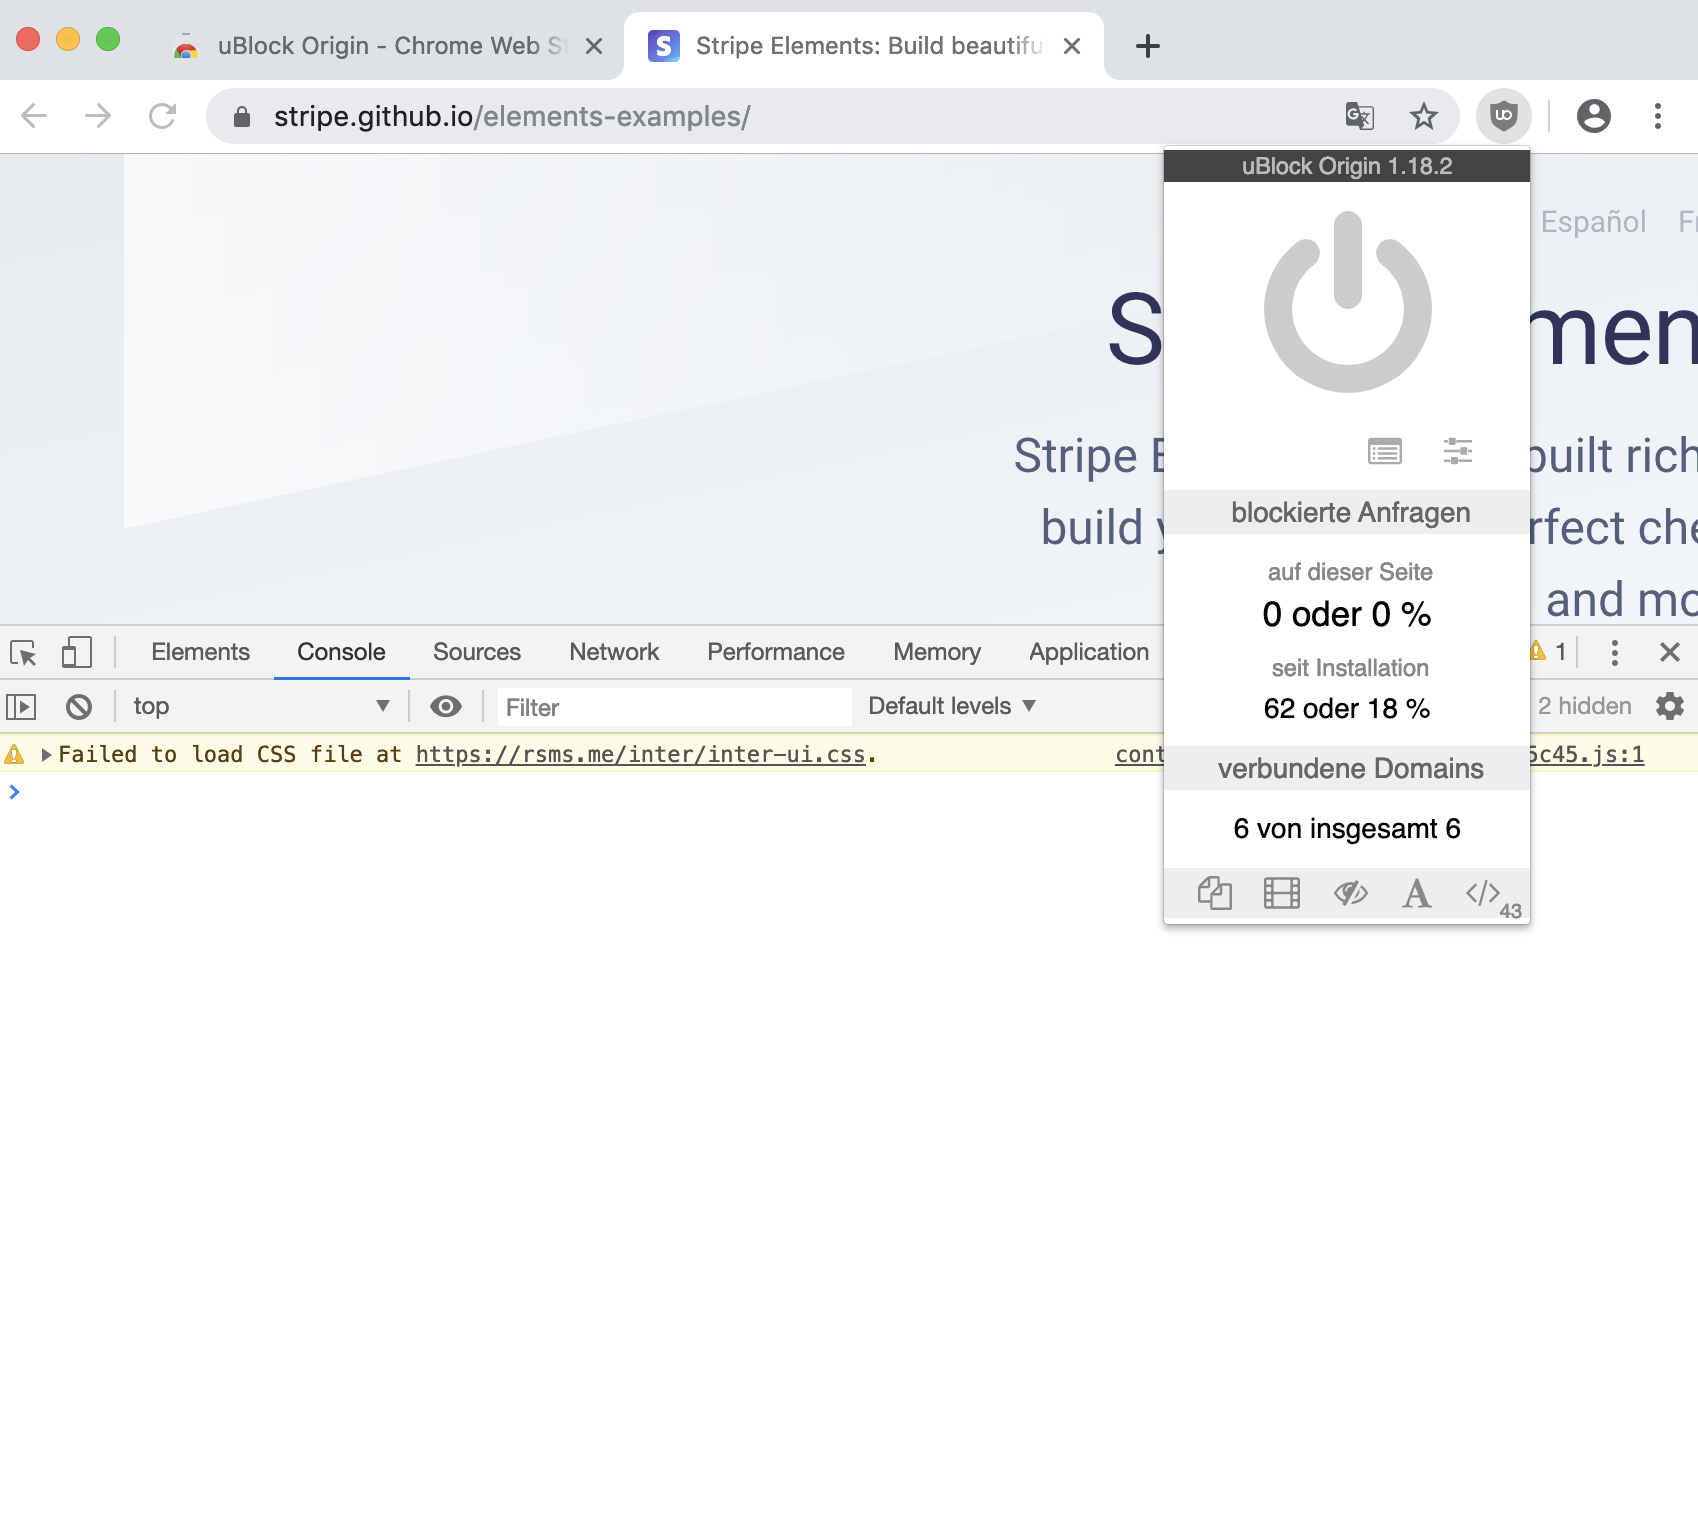 uBlock Origin blocks some network requests from Stripe elements